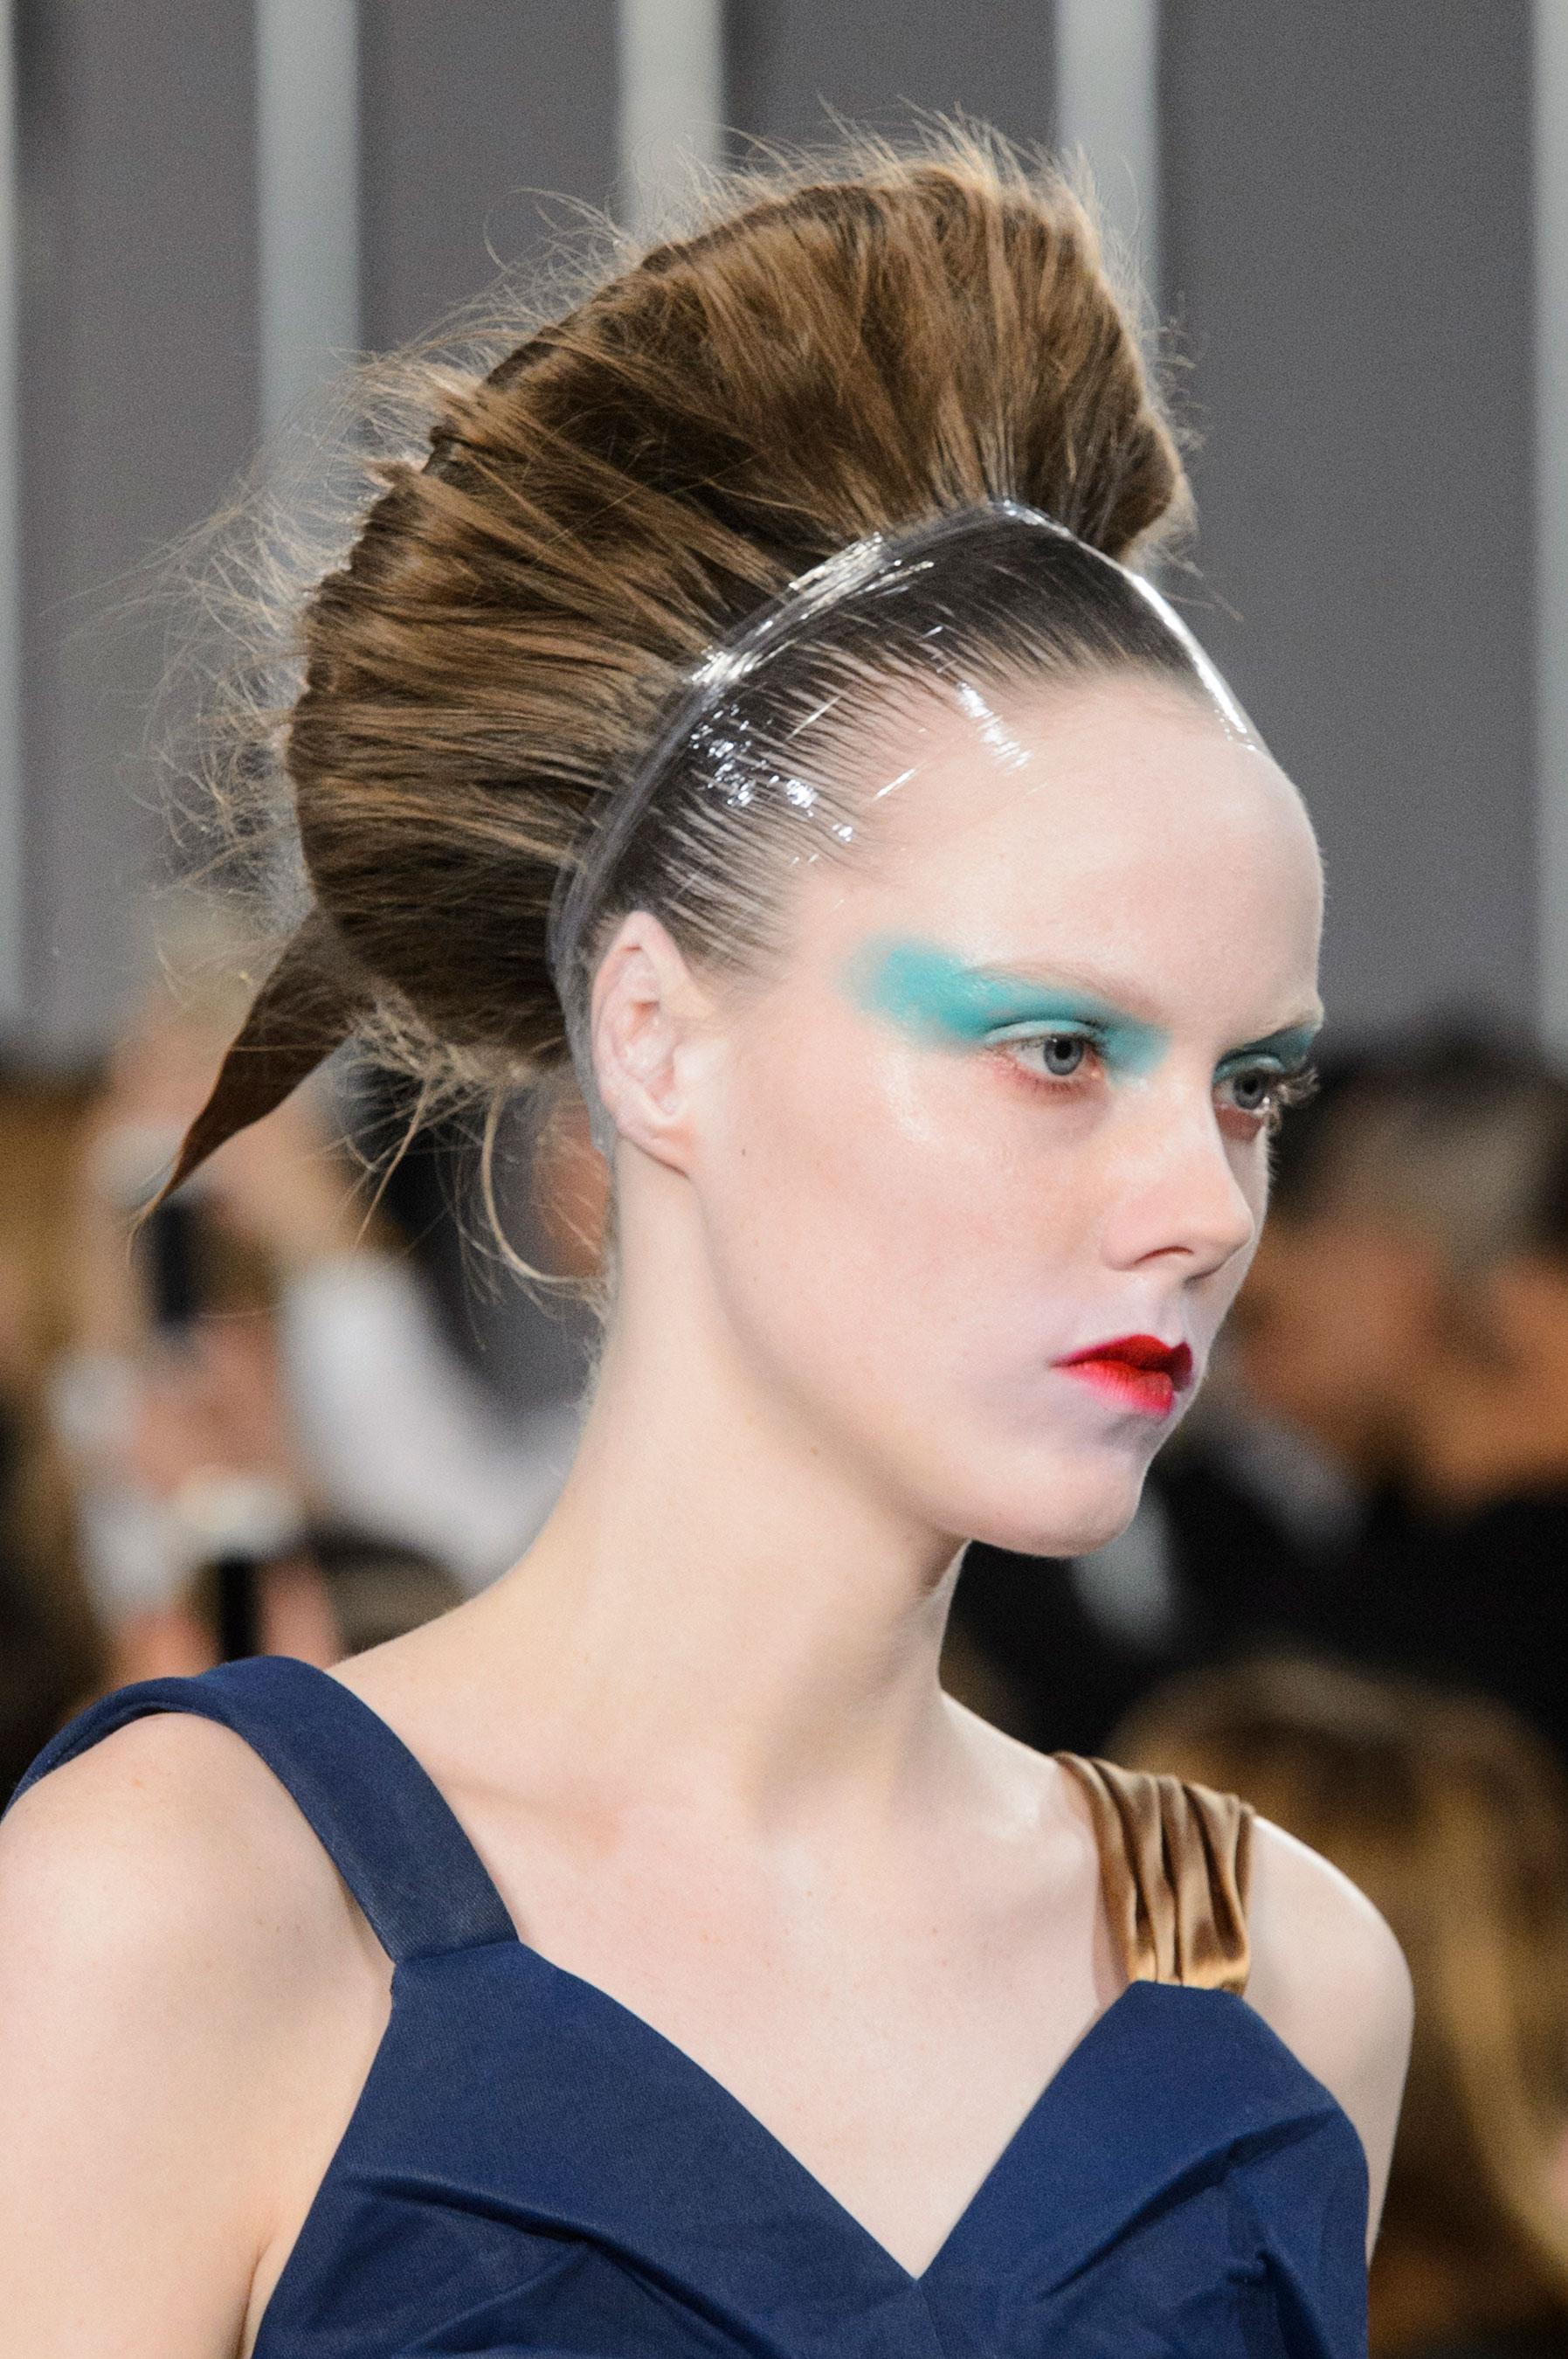 Maison-Margiela-spring-2016-runway-beauty-fashion-show-the-impression-020